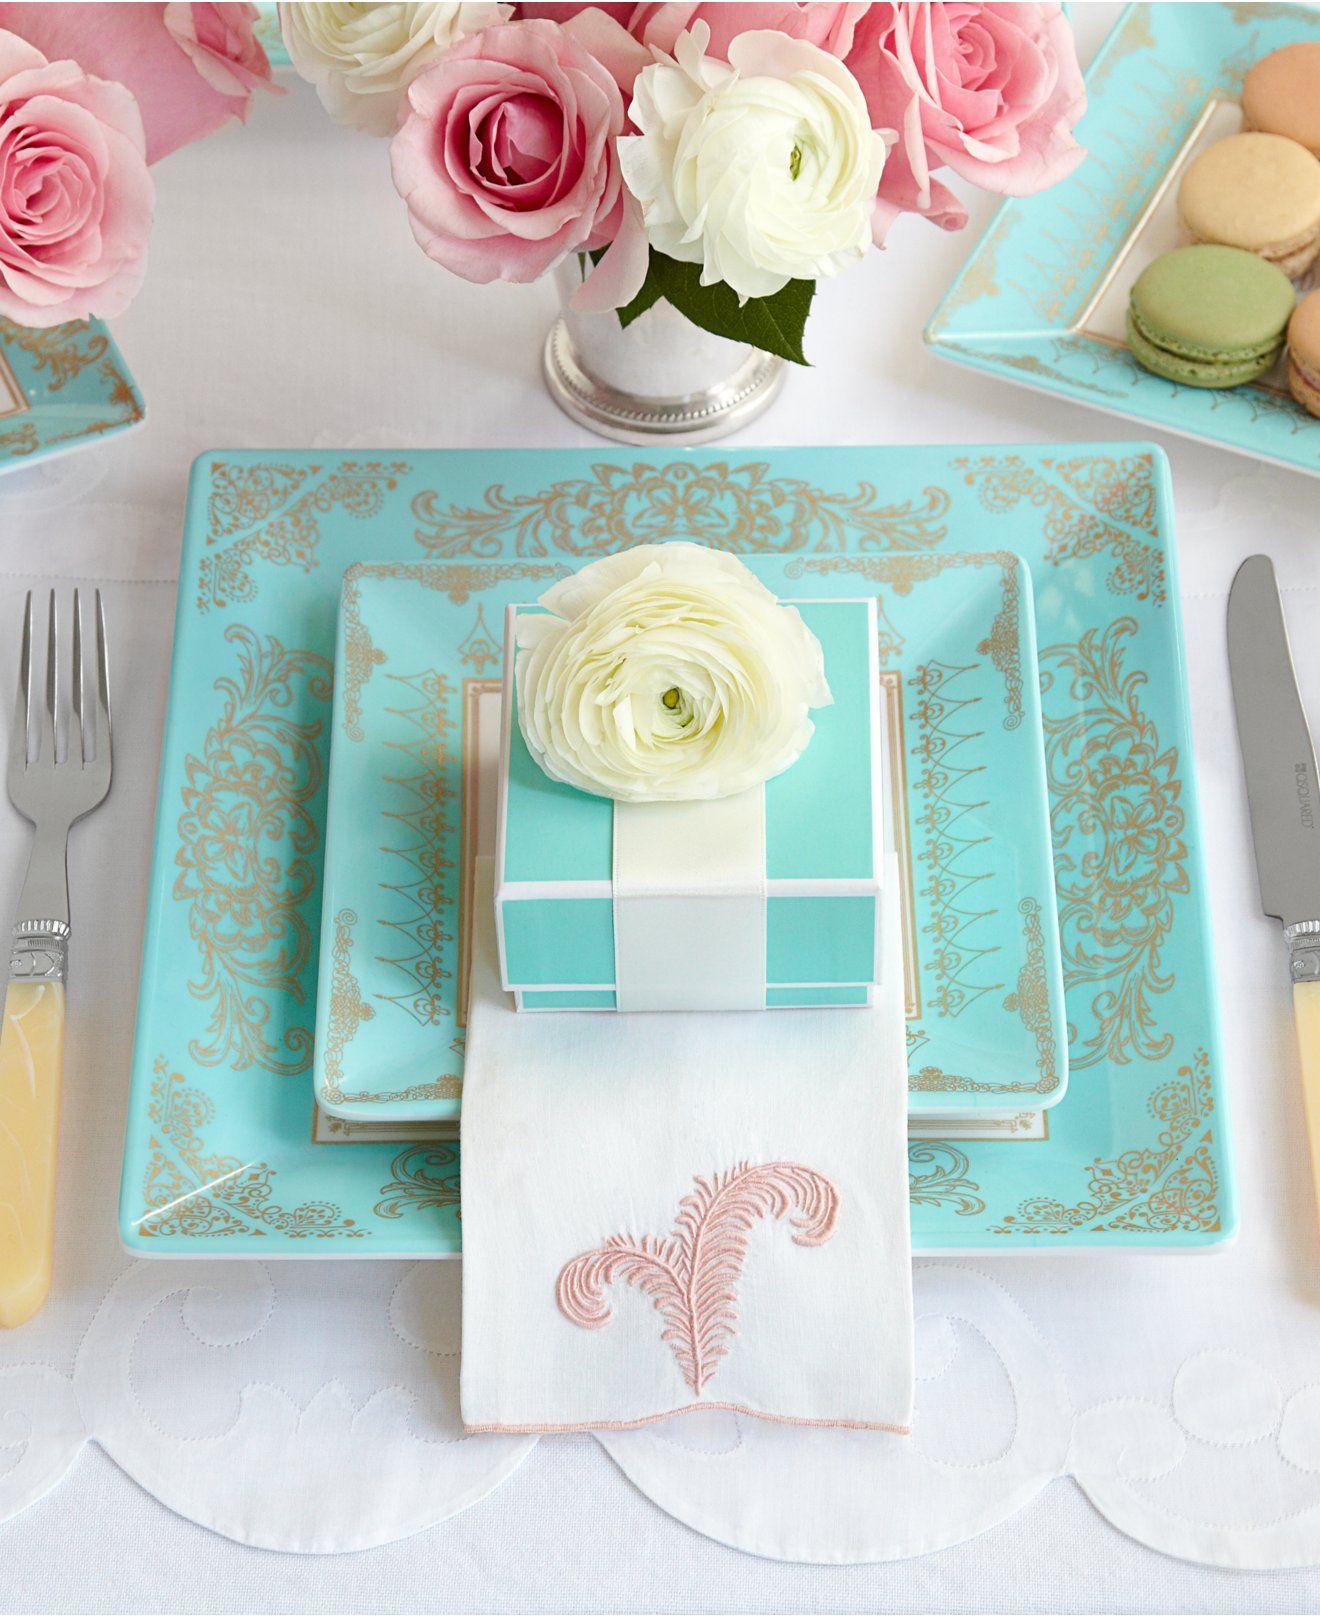 Pembroke Melamine Serveware Collection | Dining | Pinterest ...